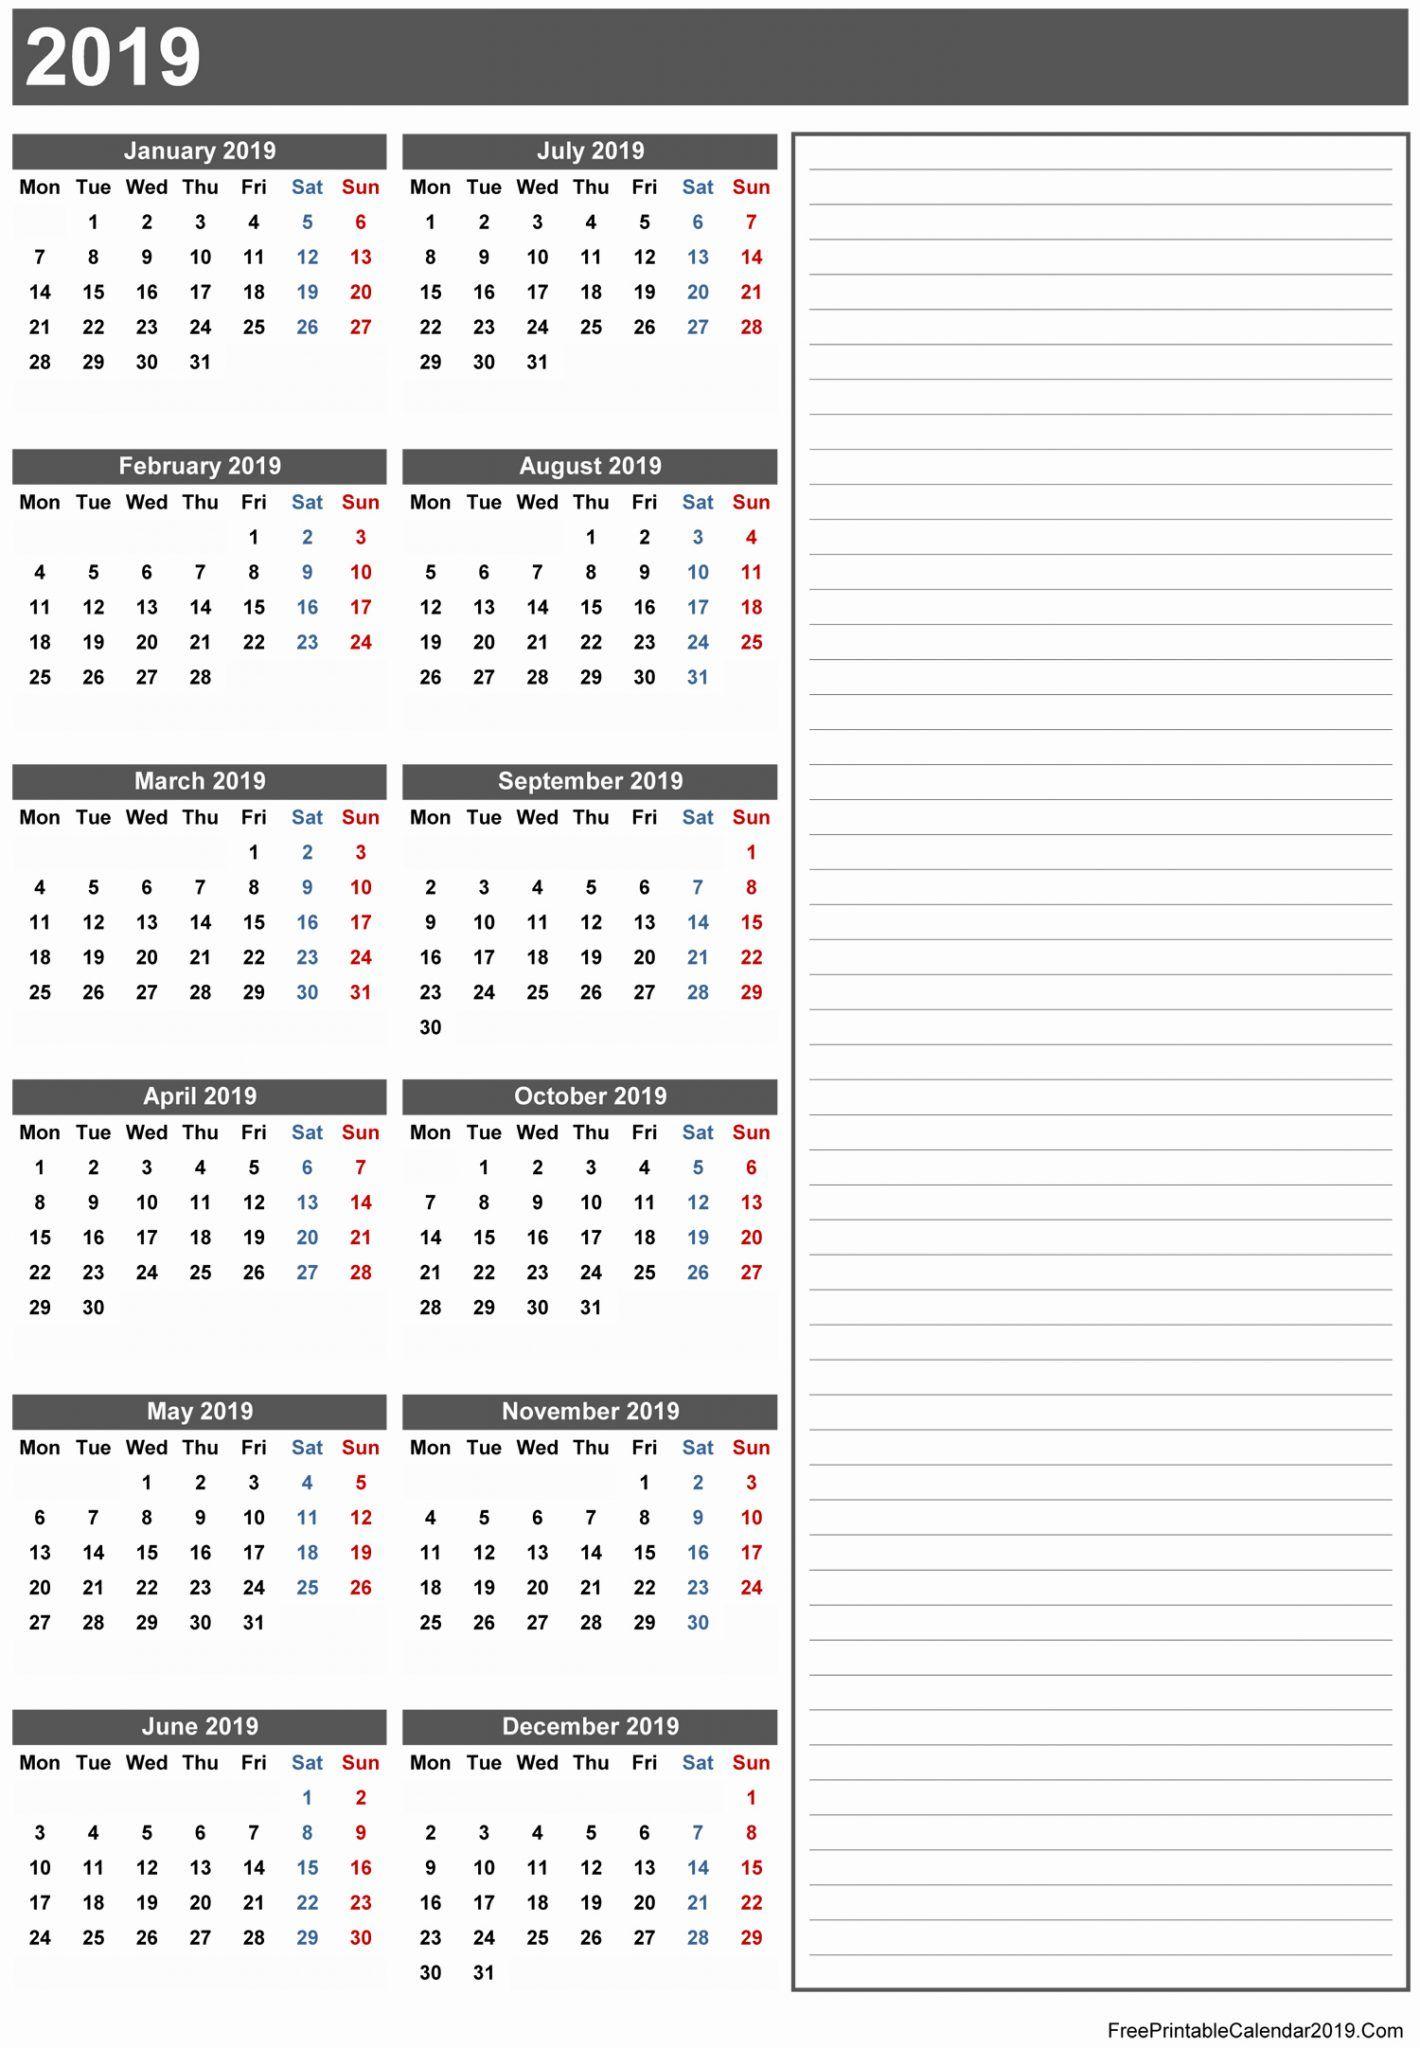 Free Printable Calendar 2019 with Holidays | Blank 12 ...